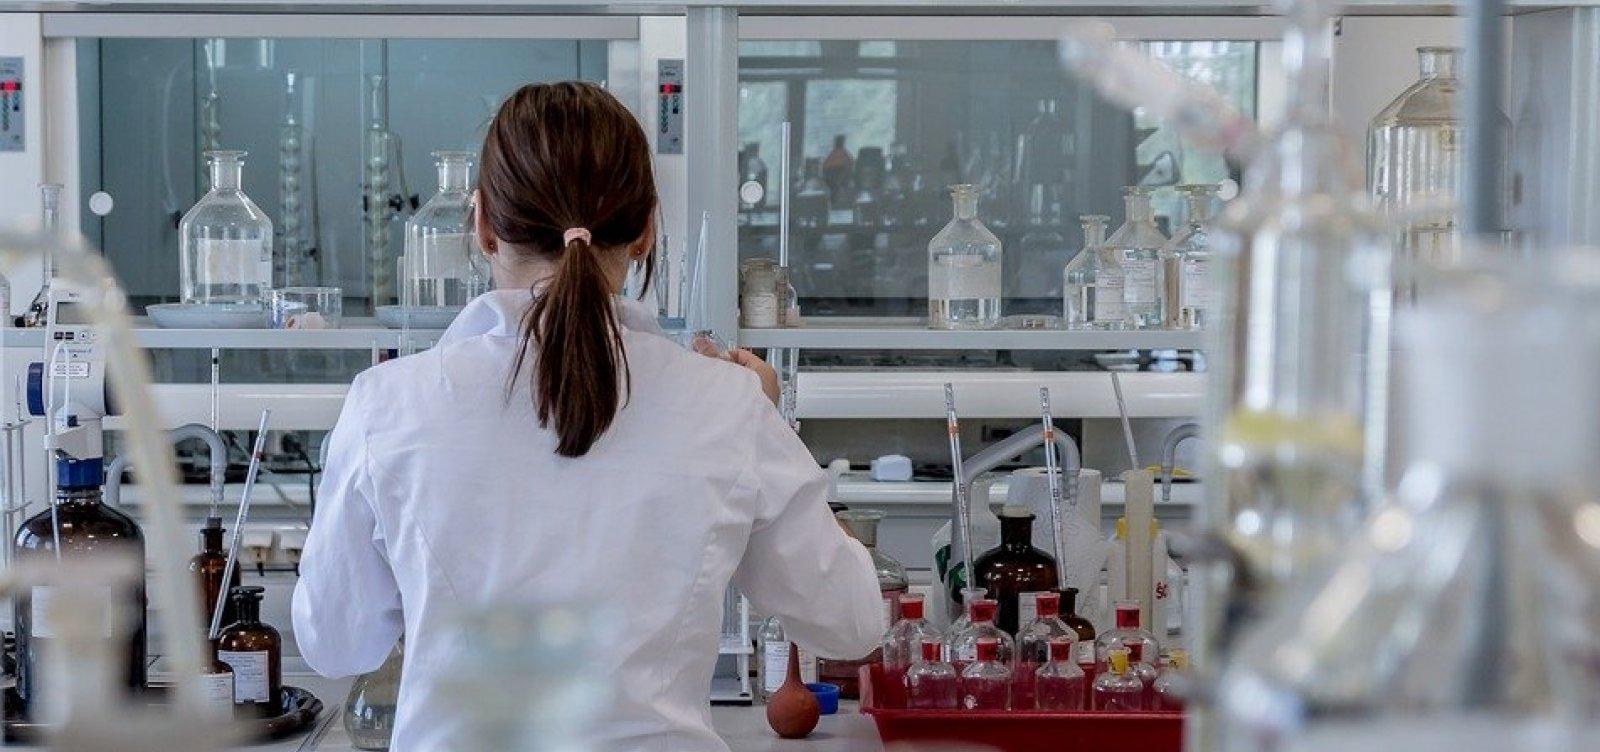 [Vírus 'primo' da chikungunya é descoberto na UFRJ]